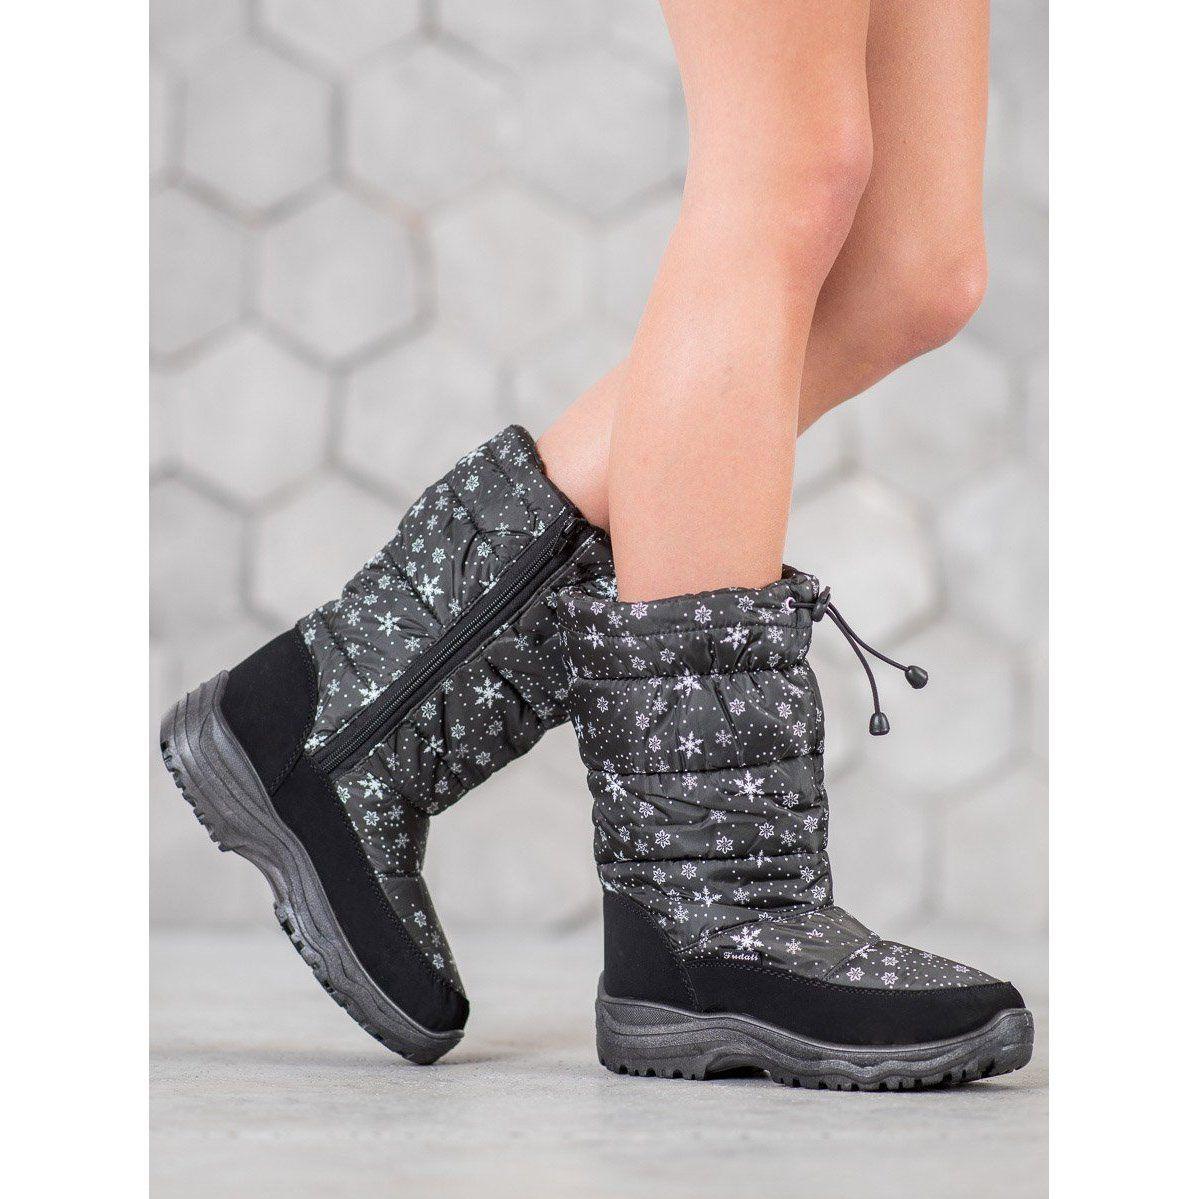 Shelovet Cieple Sniegowce Czarne Shoes Winter Boot Boots